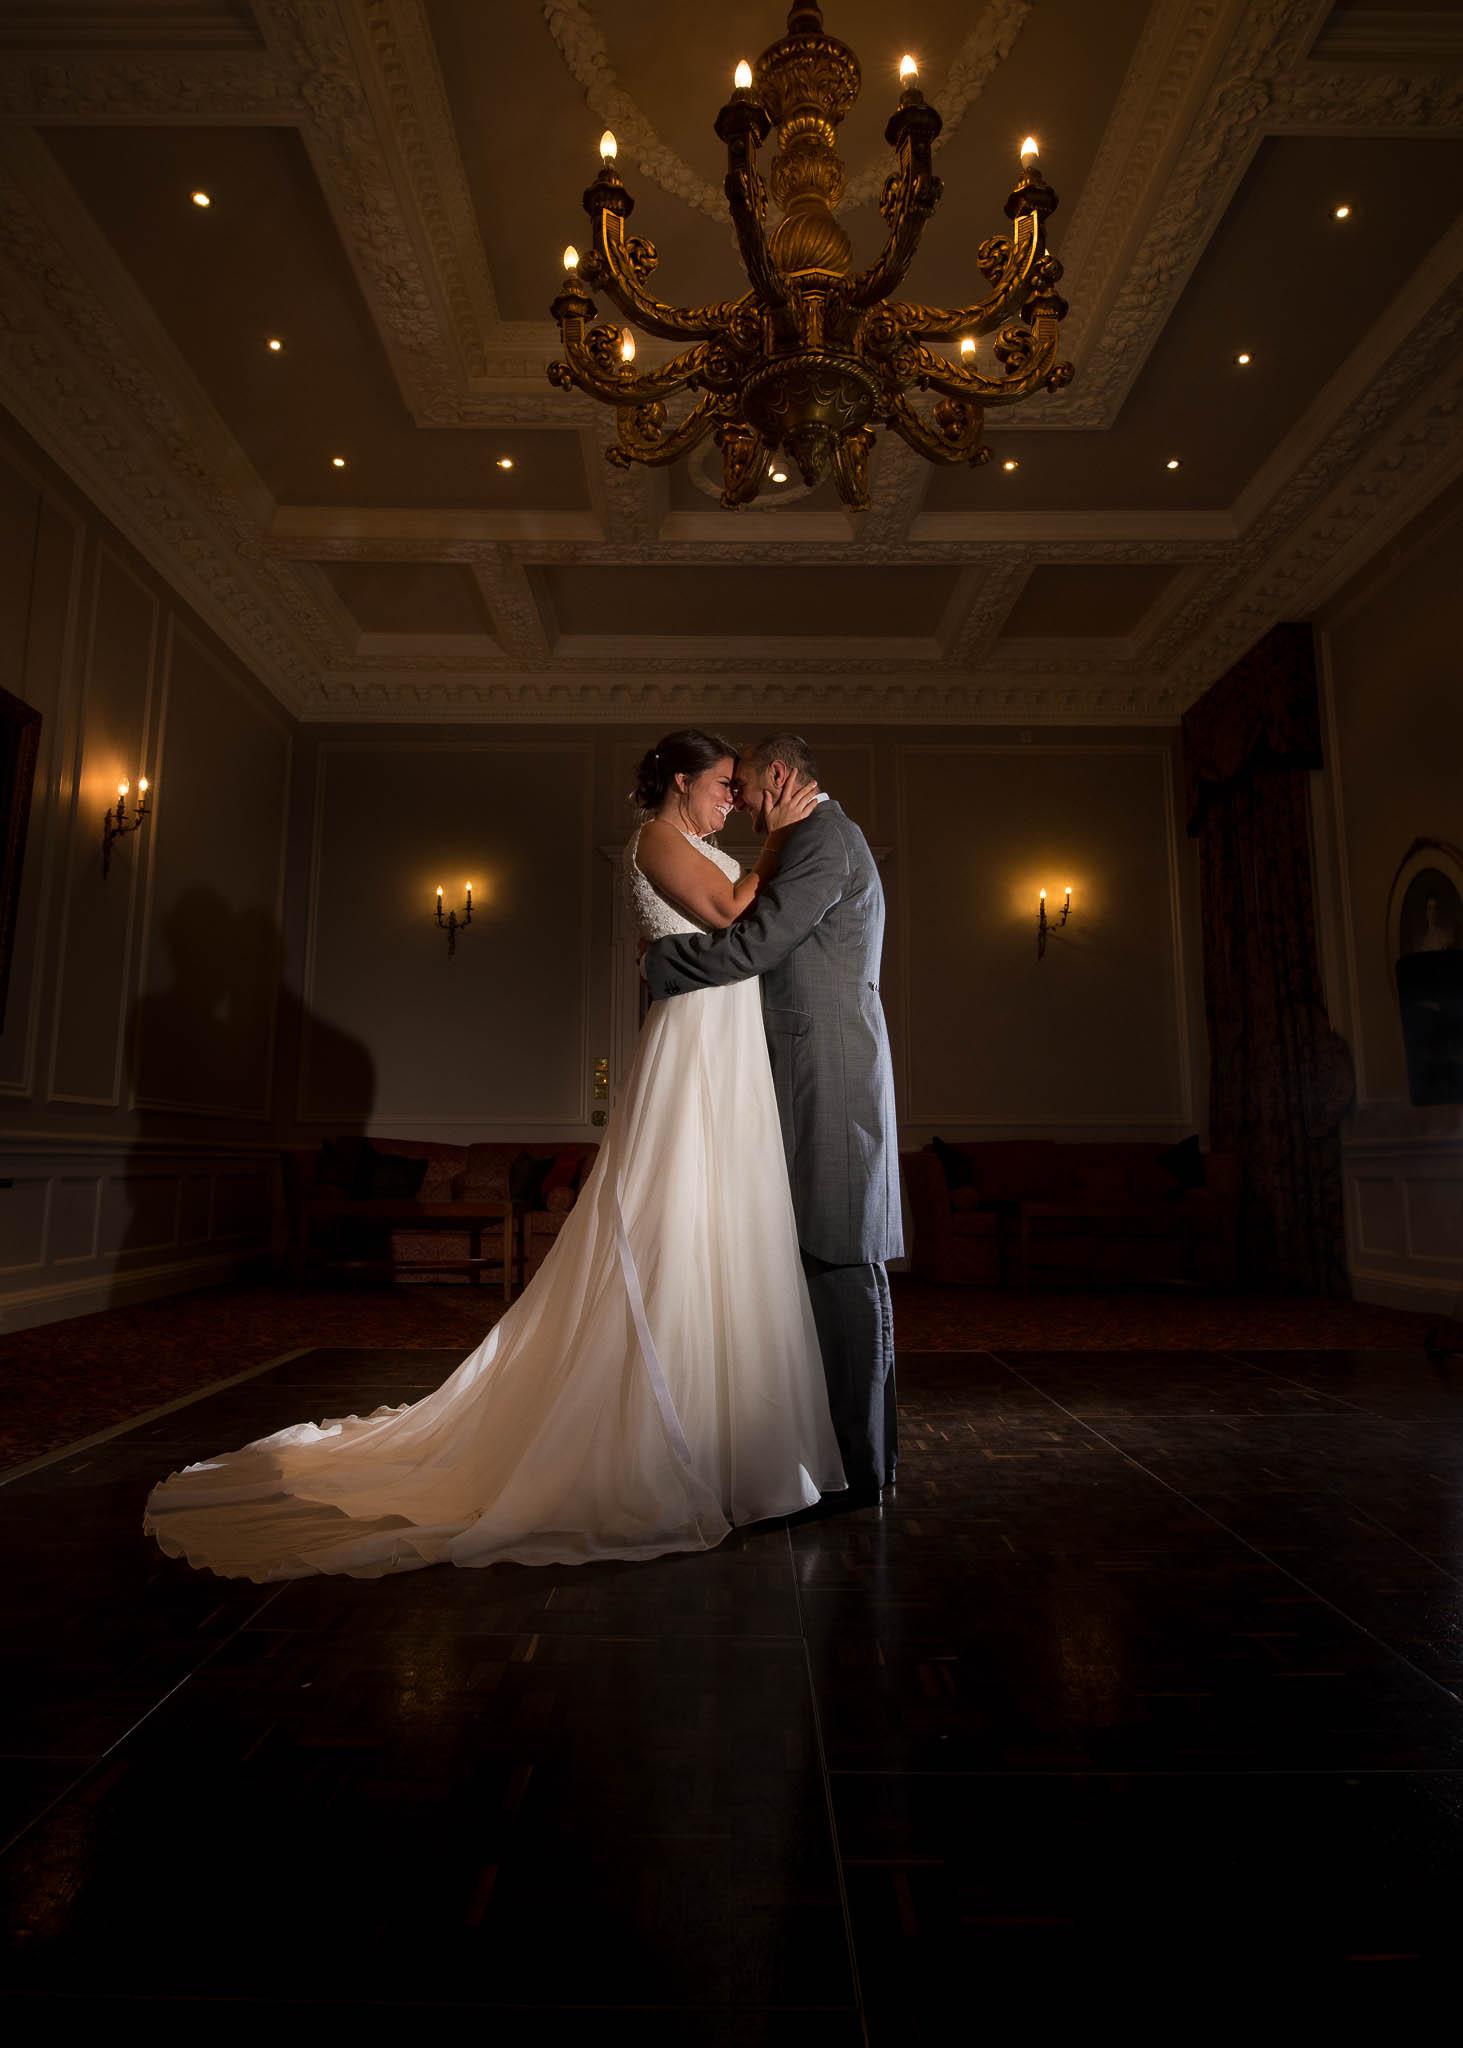 Crathorne Hall Hotel Wedding Photographer84.jpg